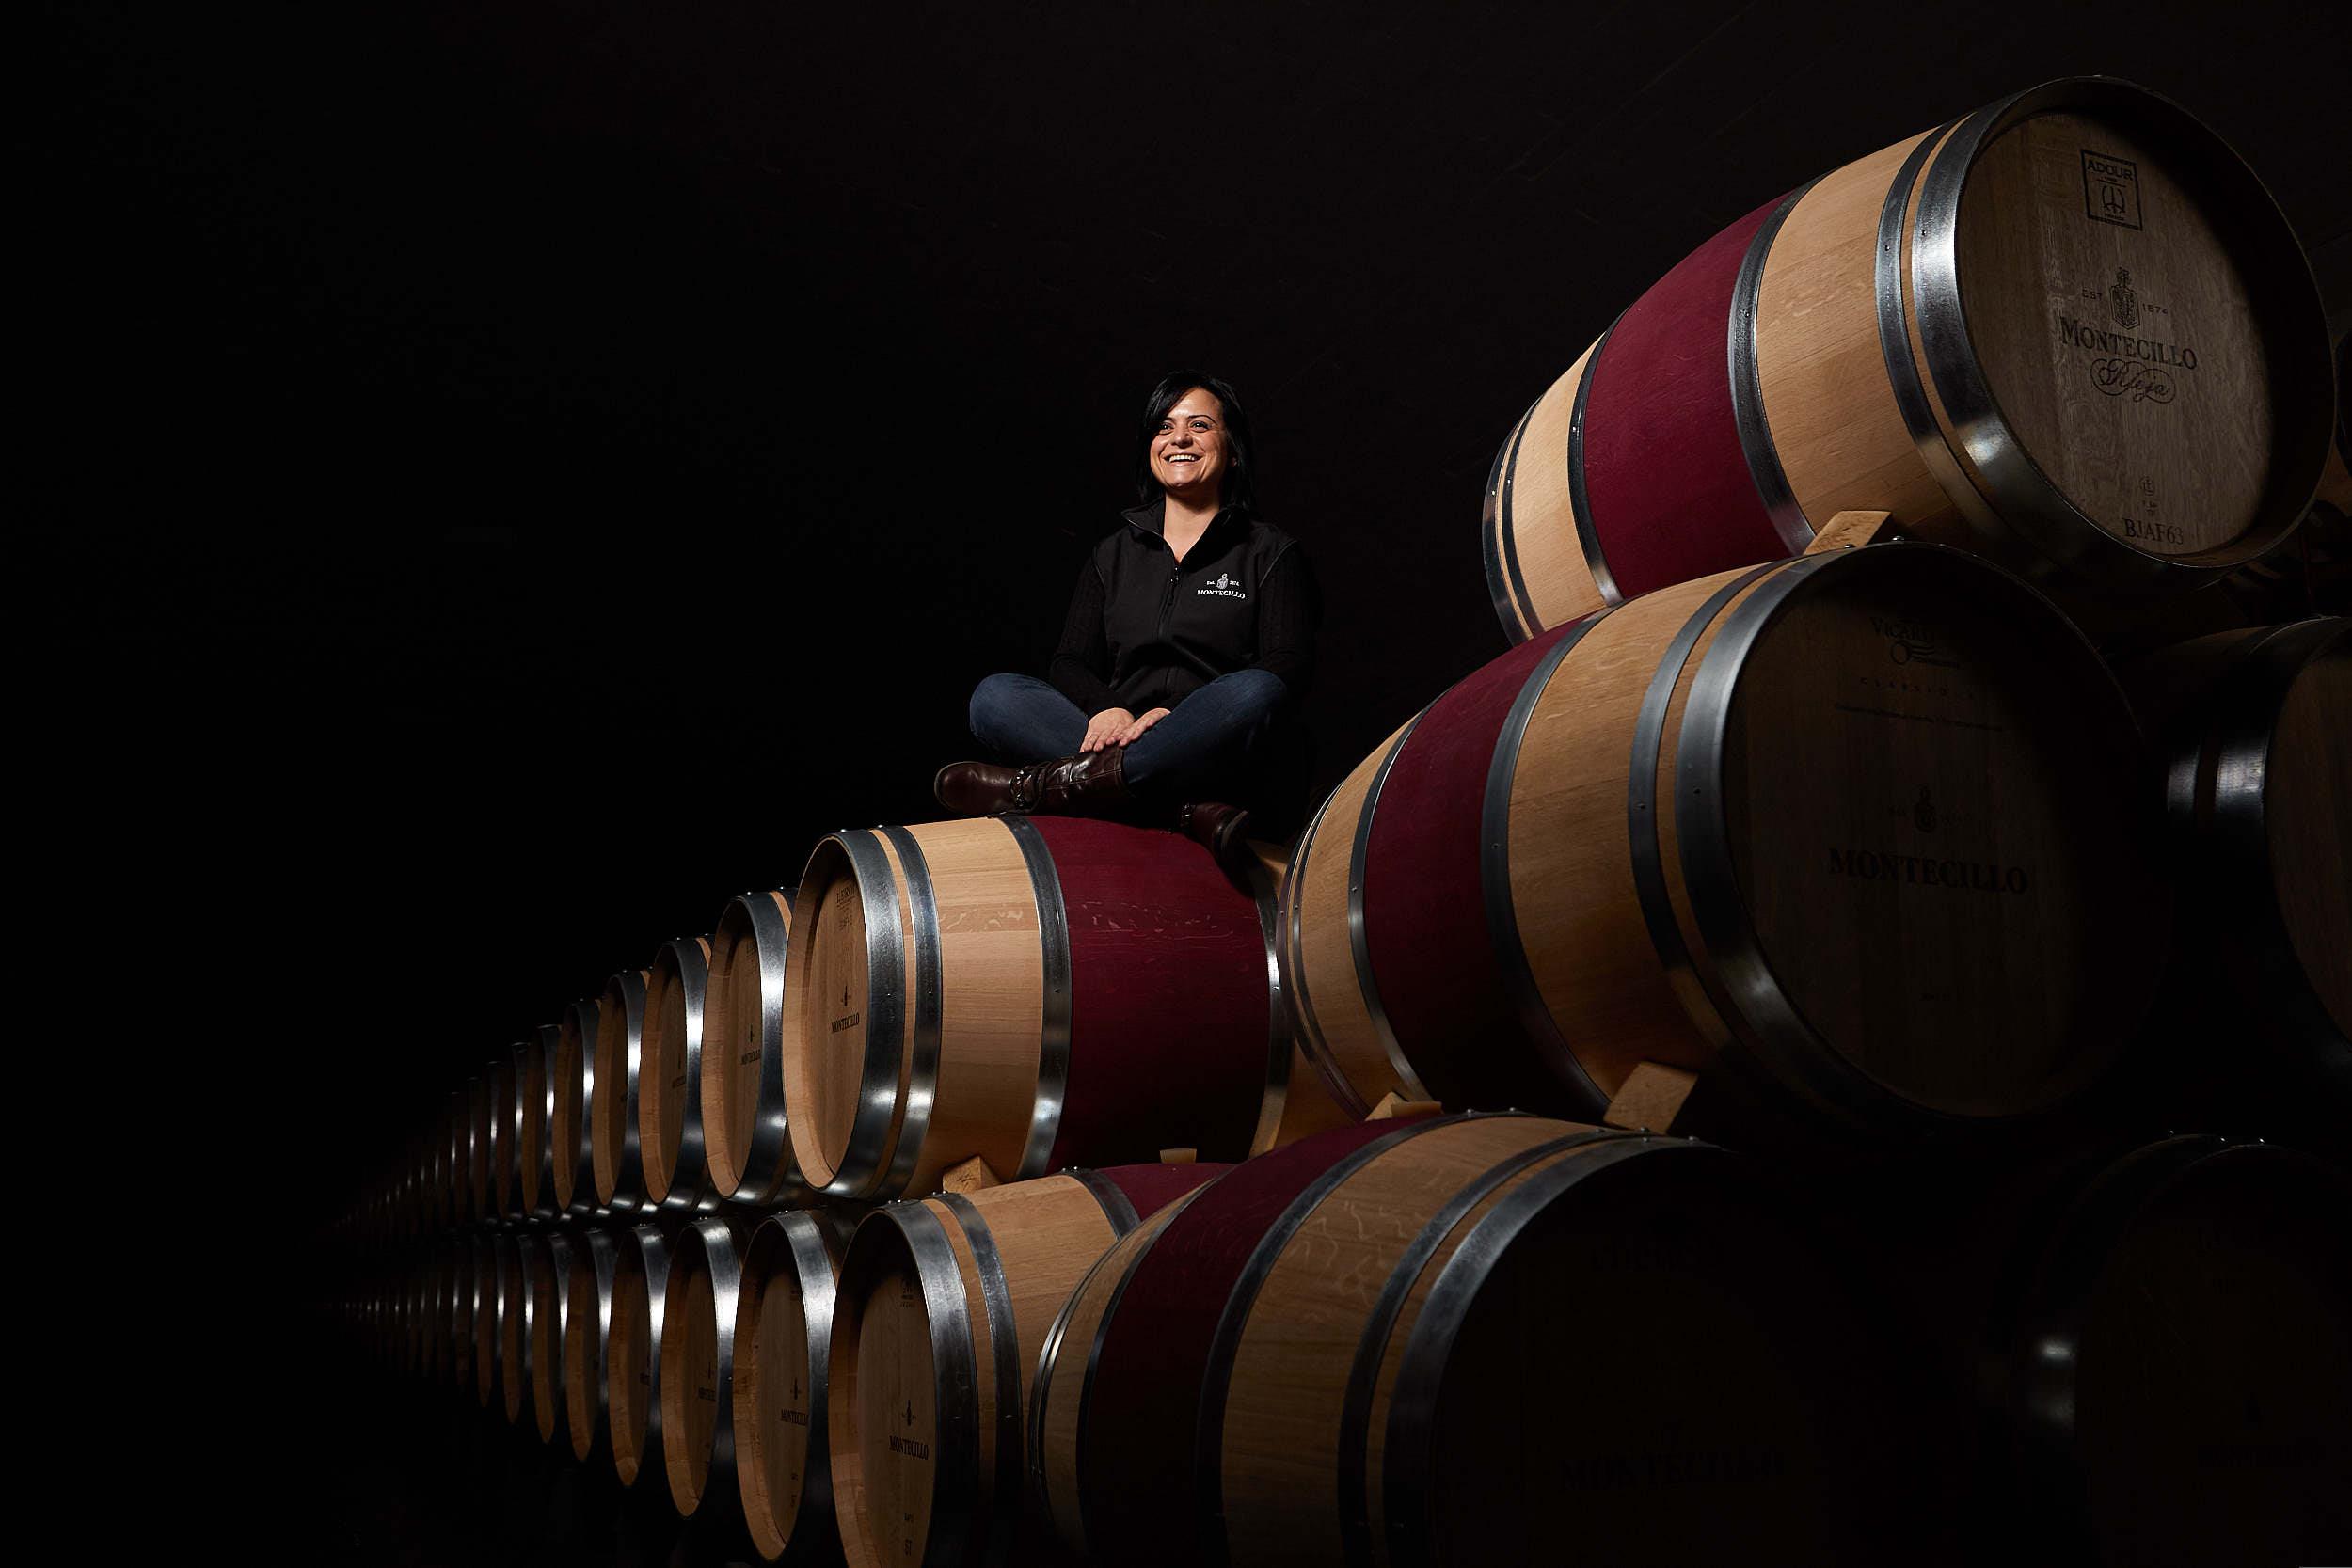 1612Bodegas_Montecillo_Wine_Photography_La_Rioja_Spain_James_Sturcke_sturcke.org_0011.jpg